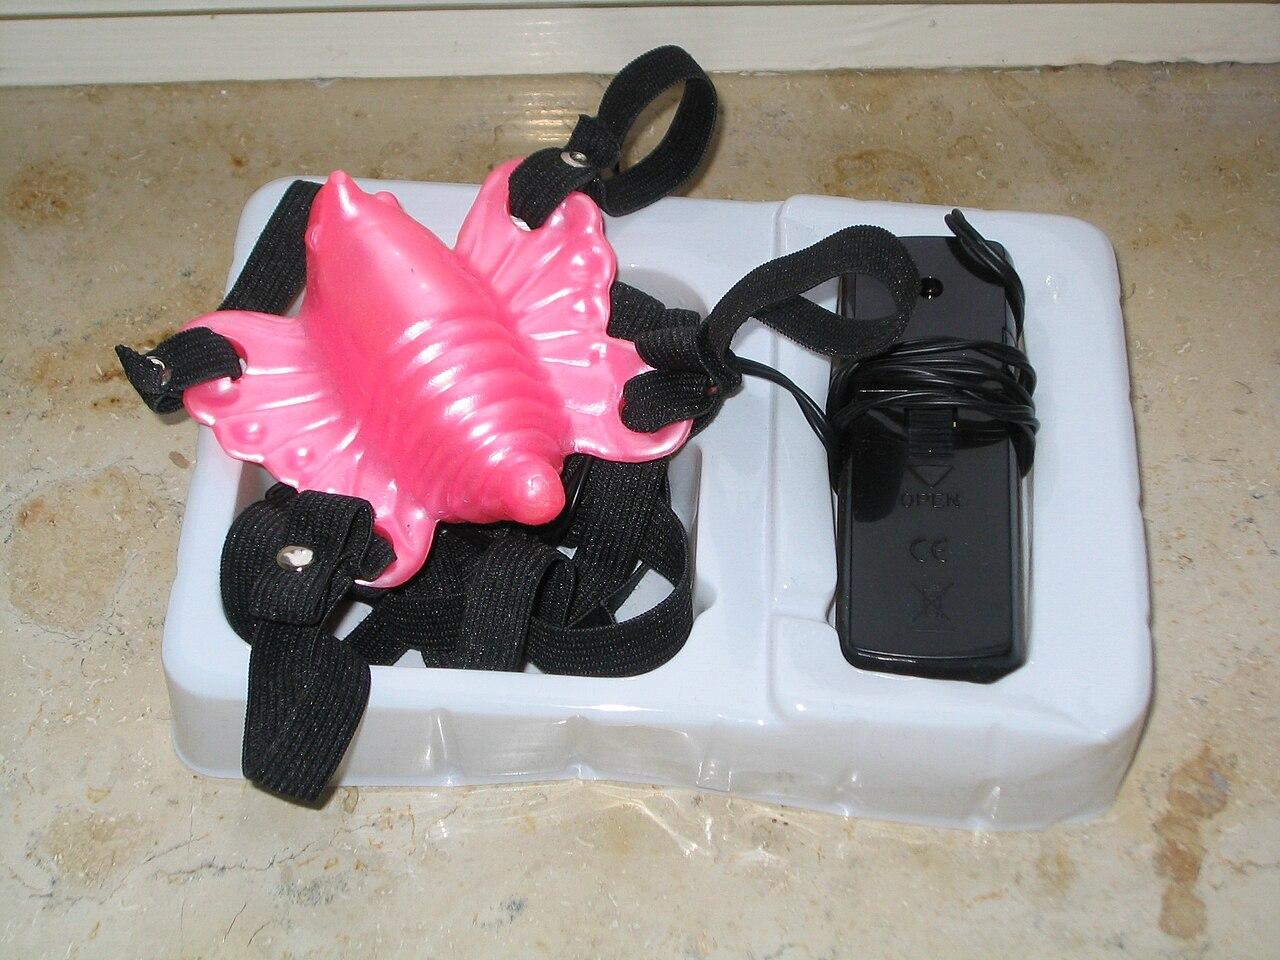 Vibrator (sex toy)